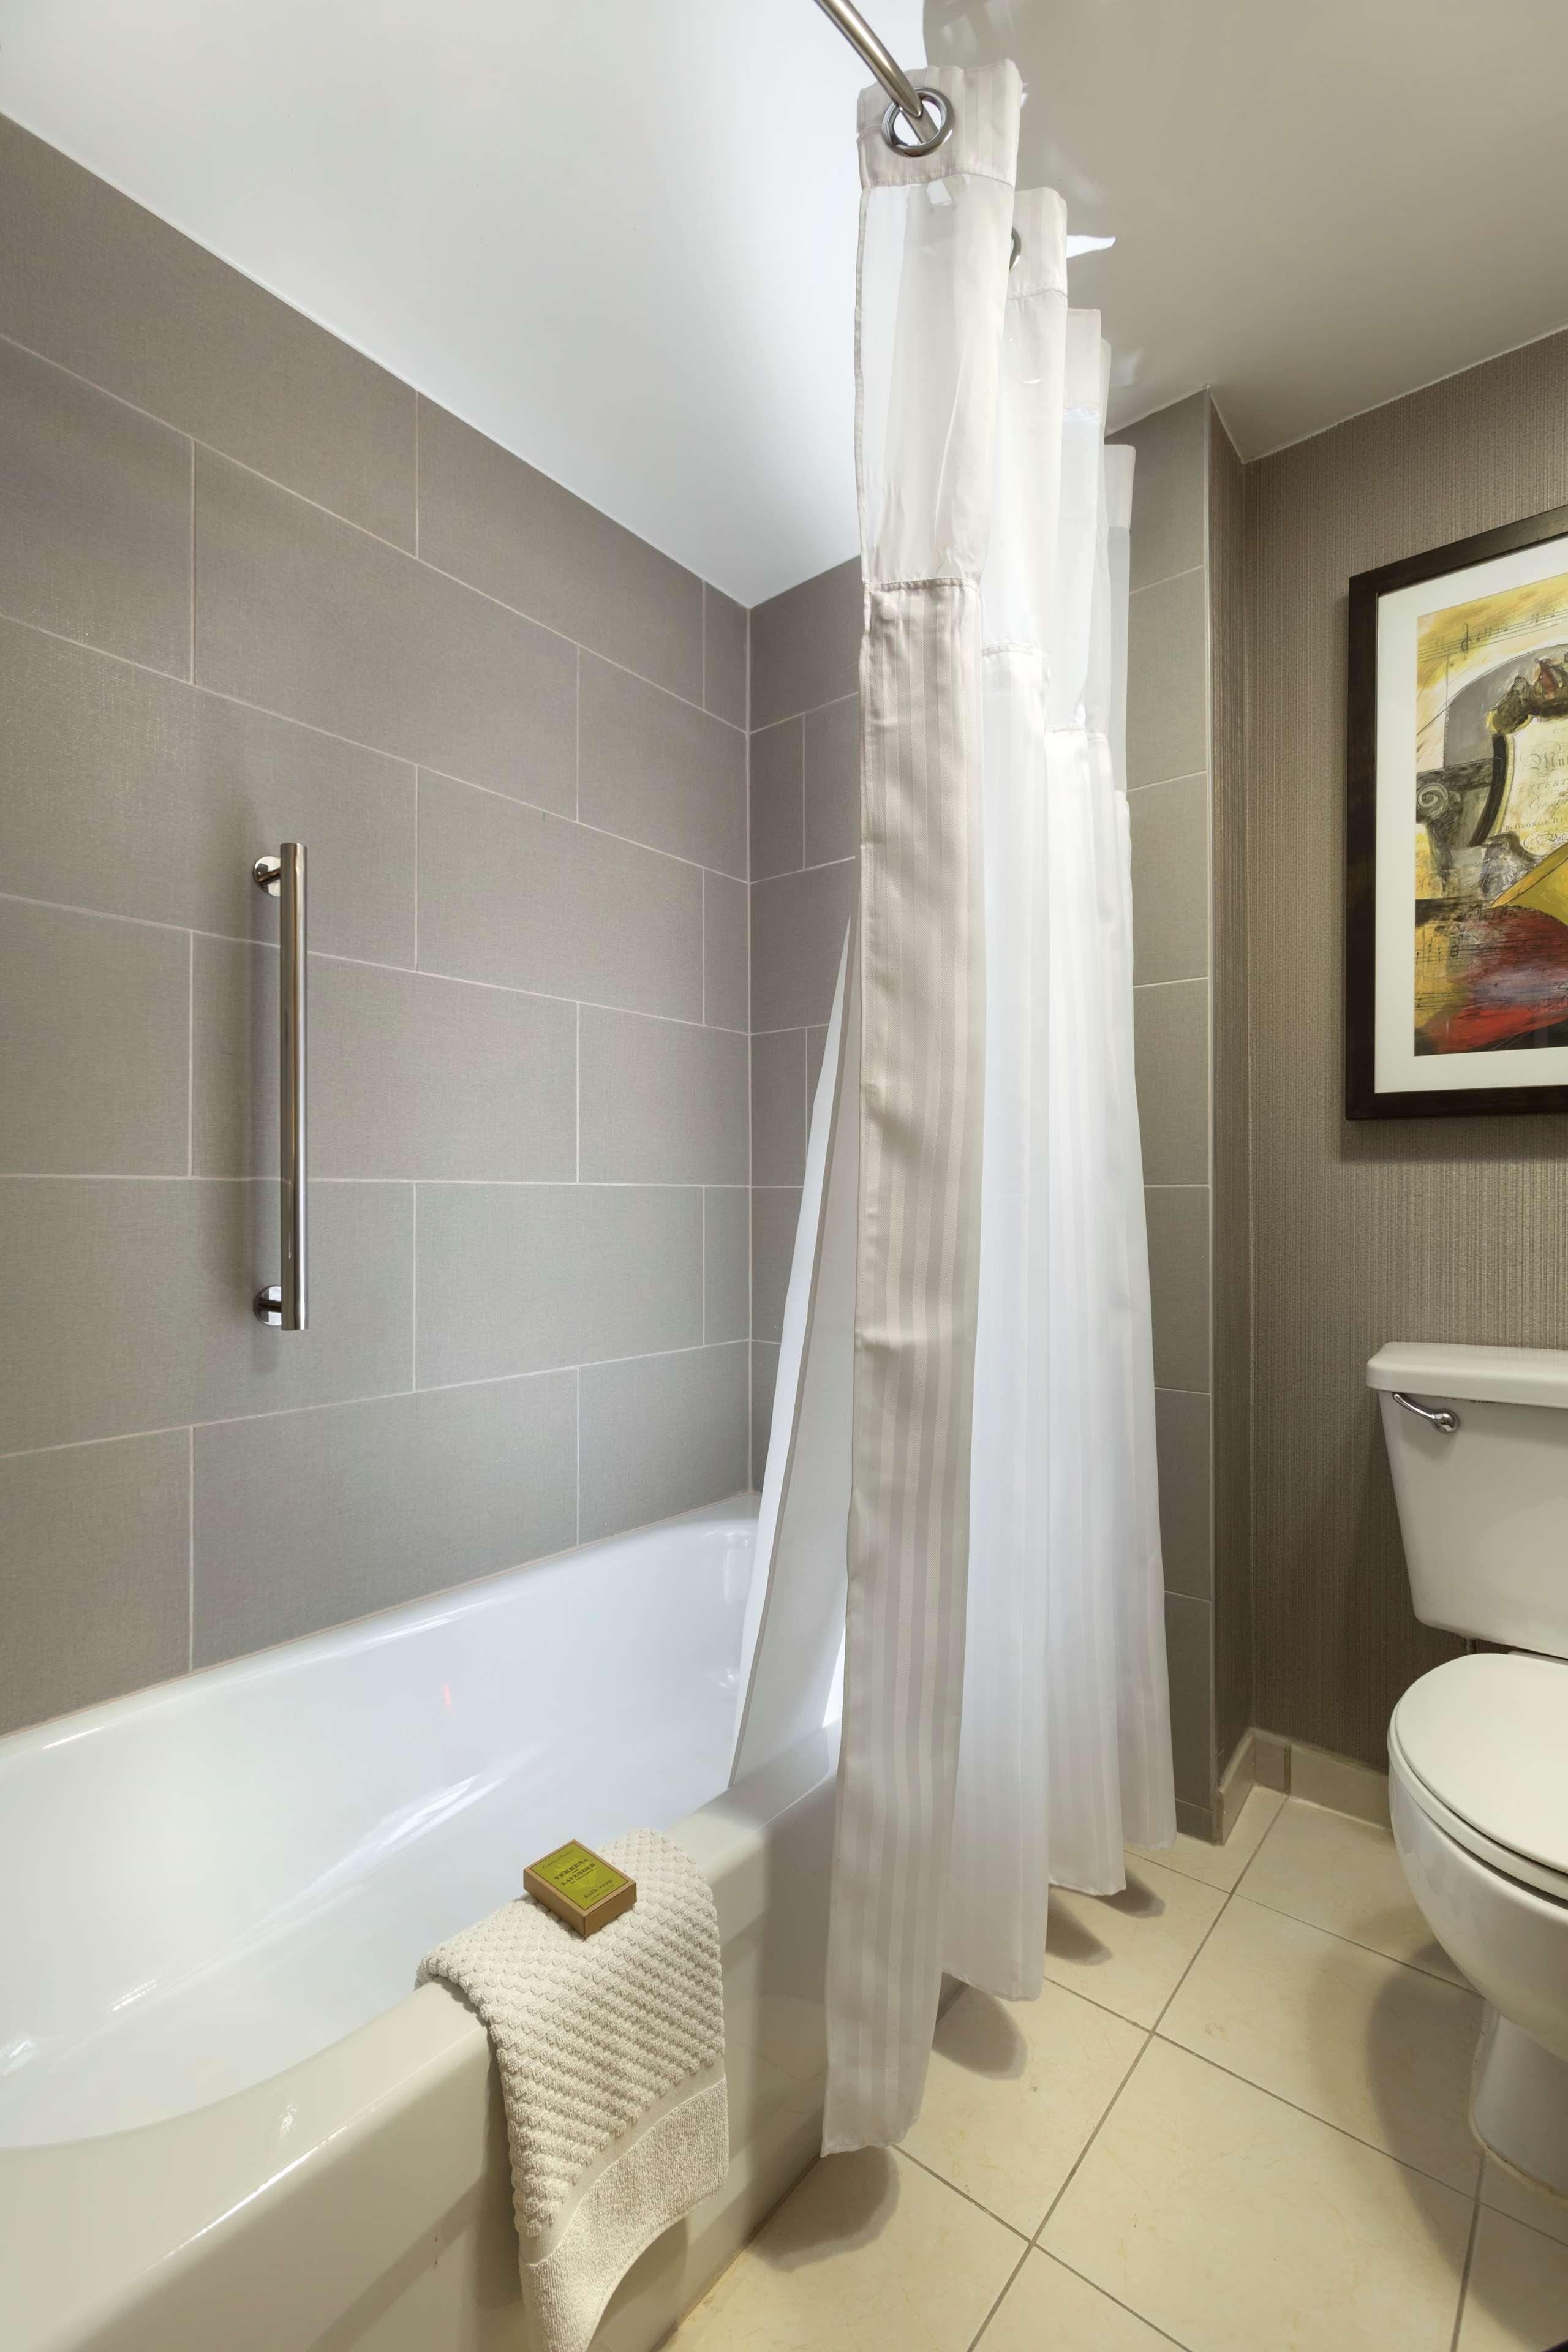 DoubleTree Suites by Hilton Hotel Nashville Airport image 28